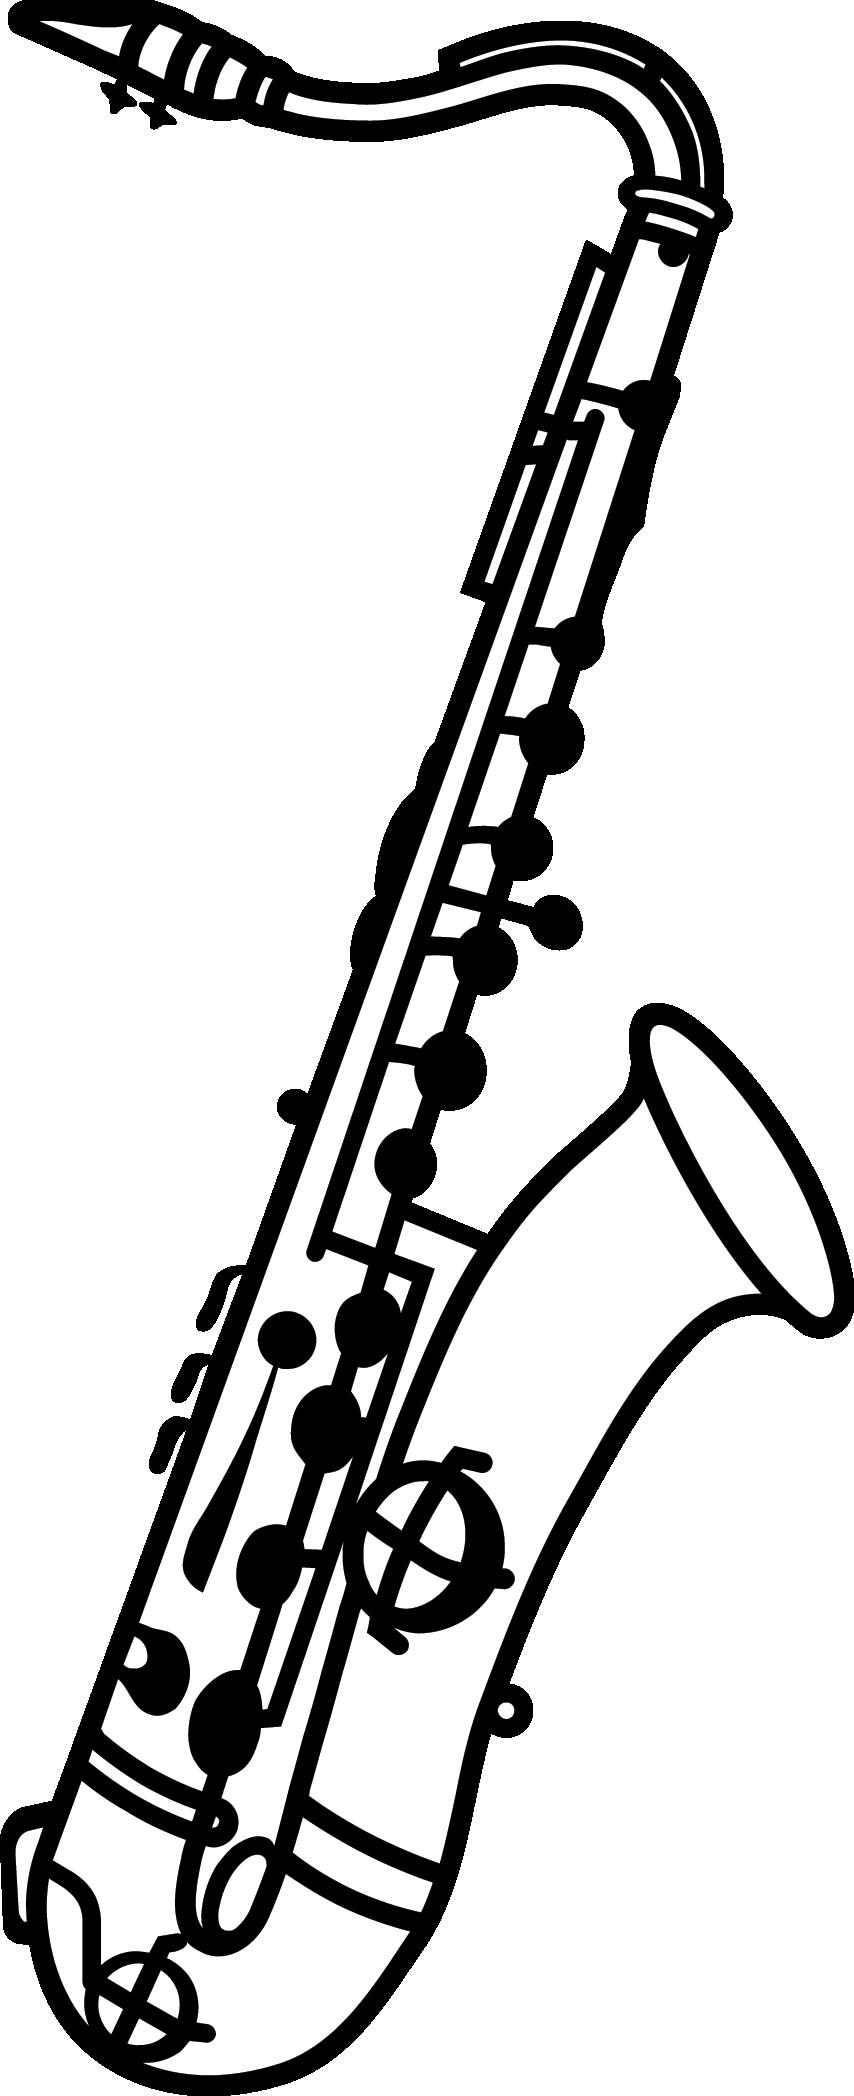 Clarinet clipart bass. Saxophon png